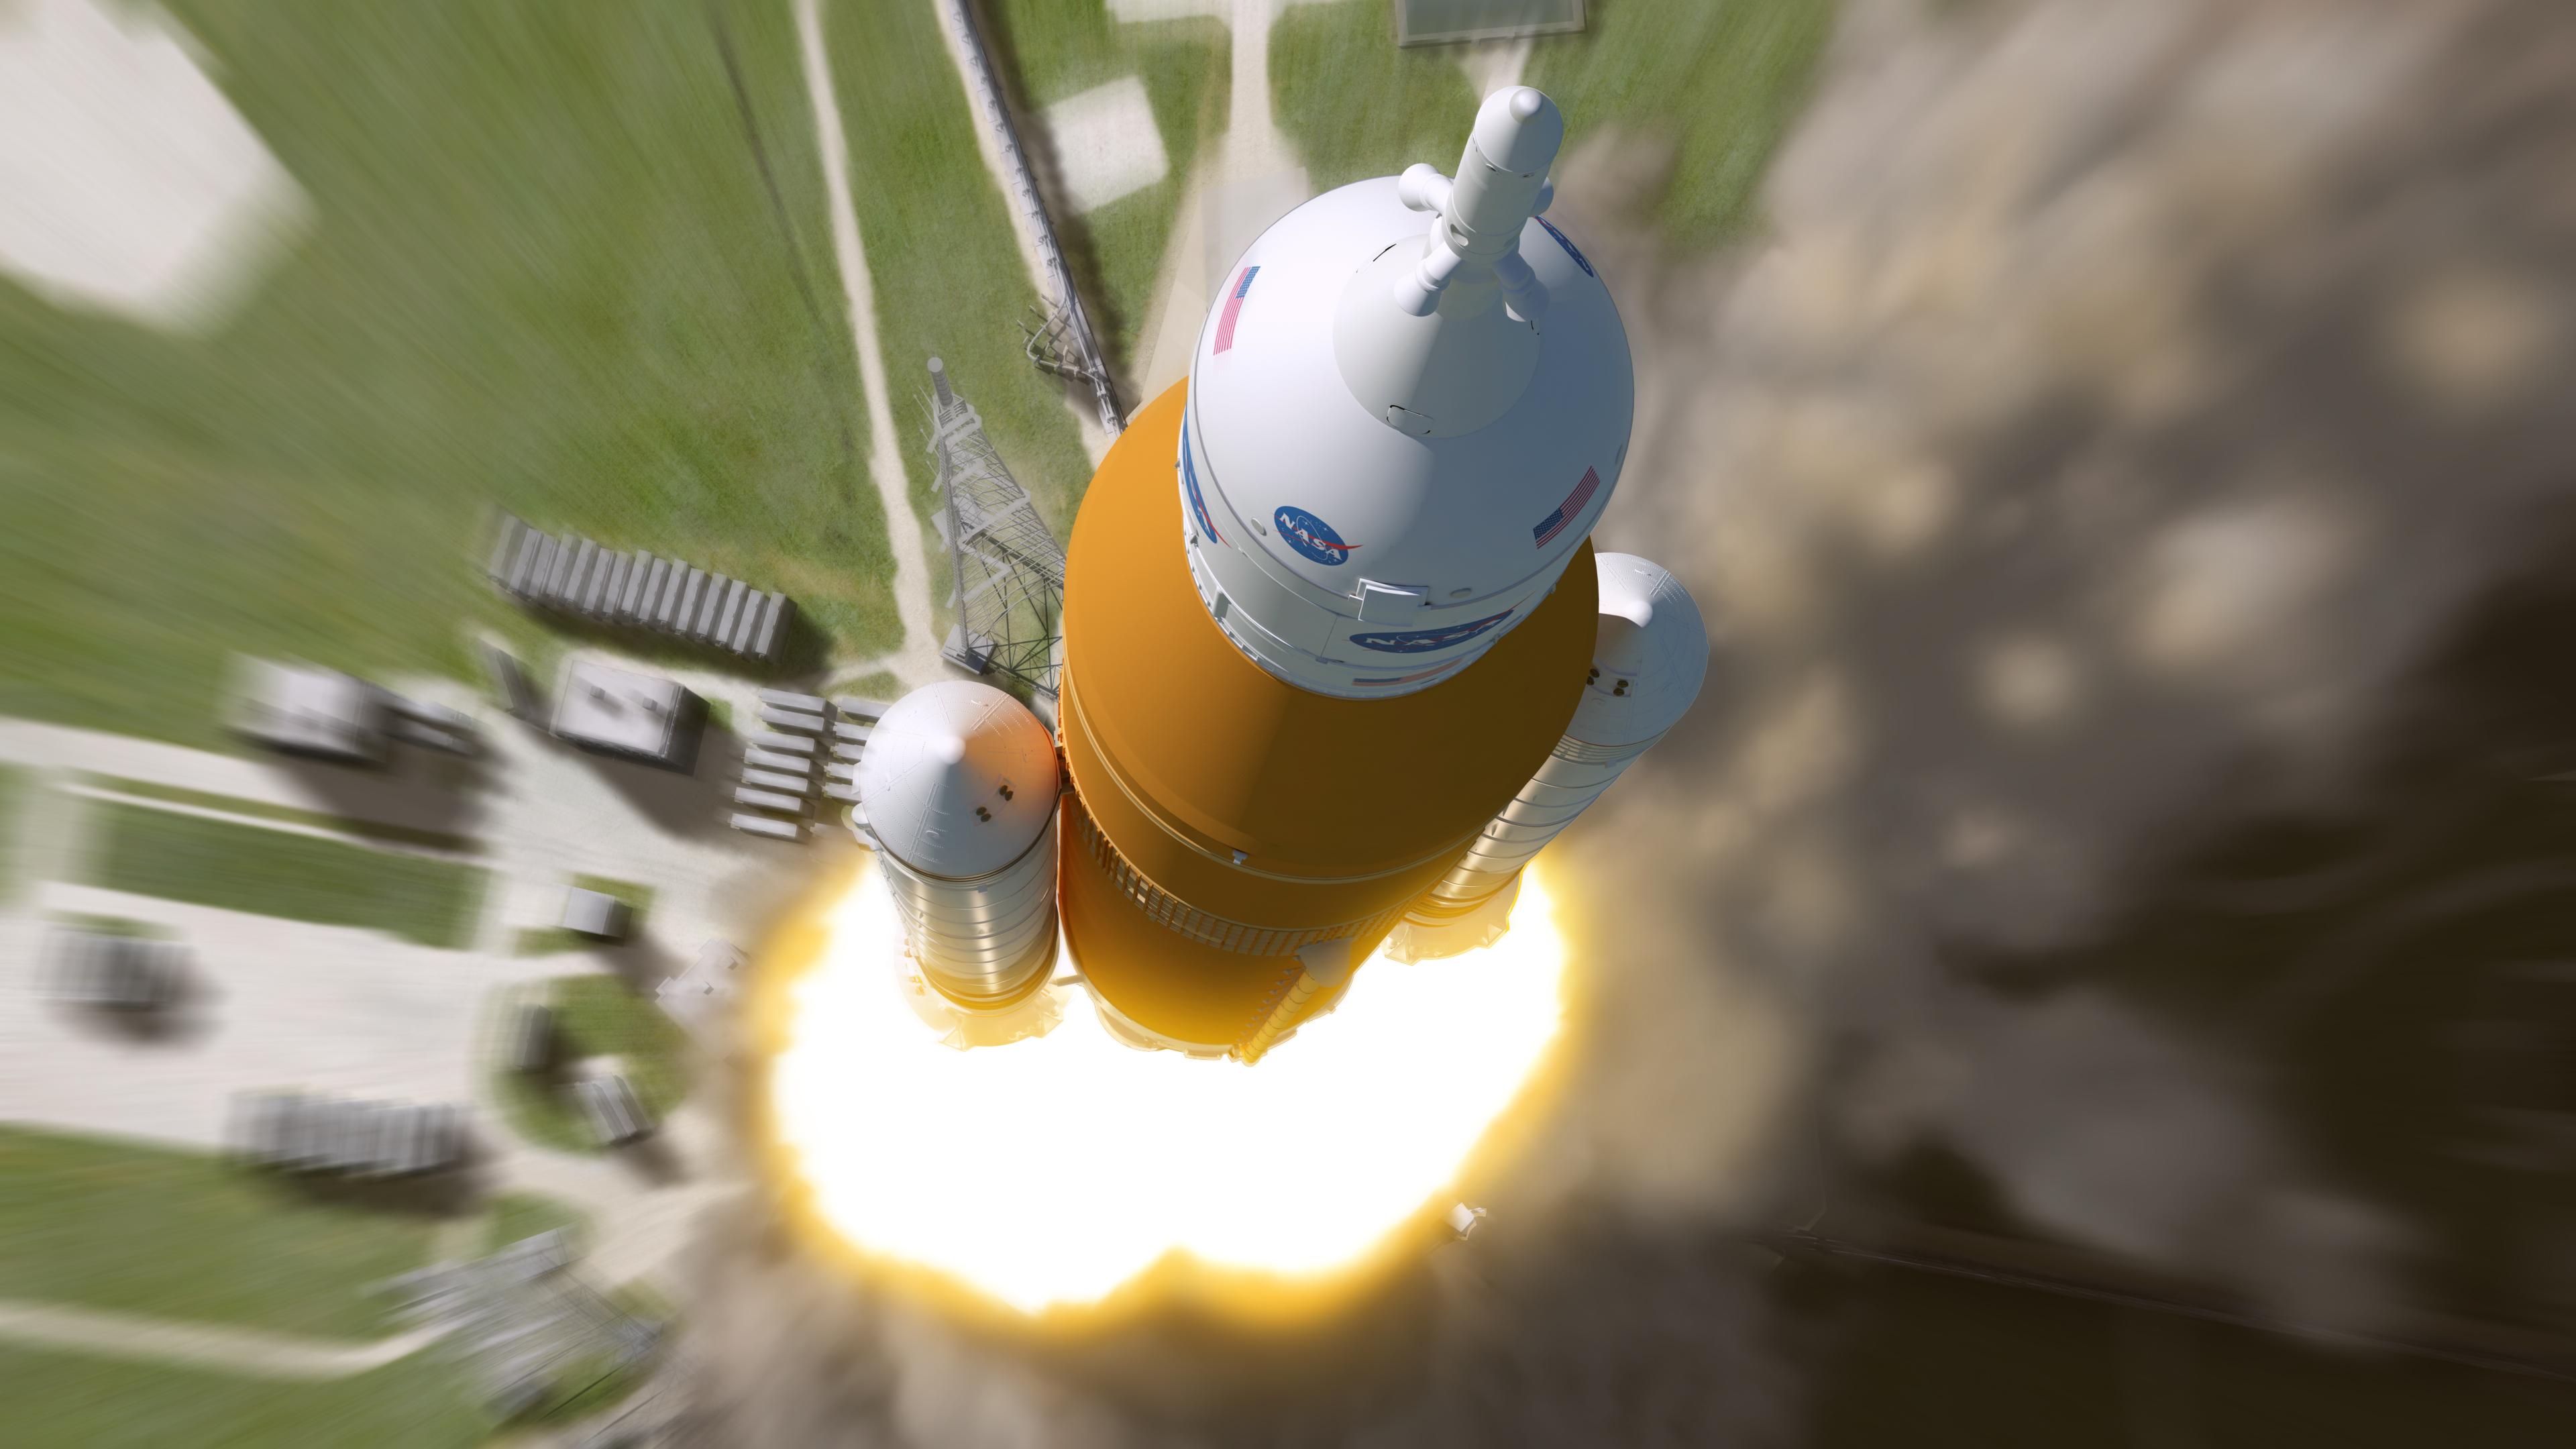 What's Next For NASA? | NASA